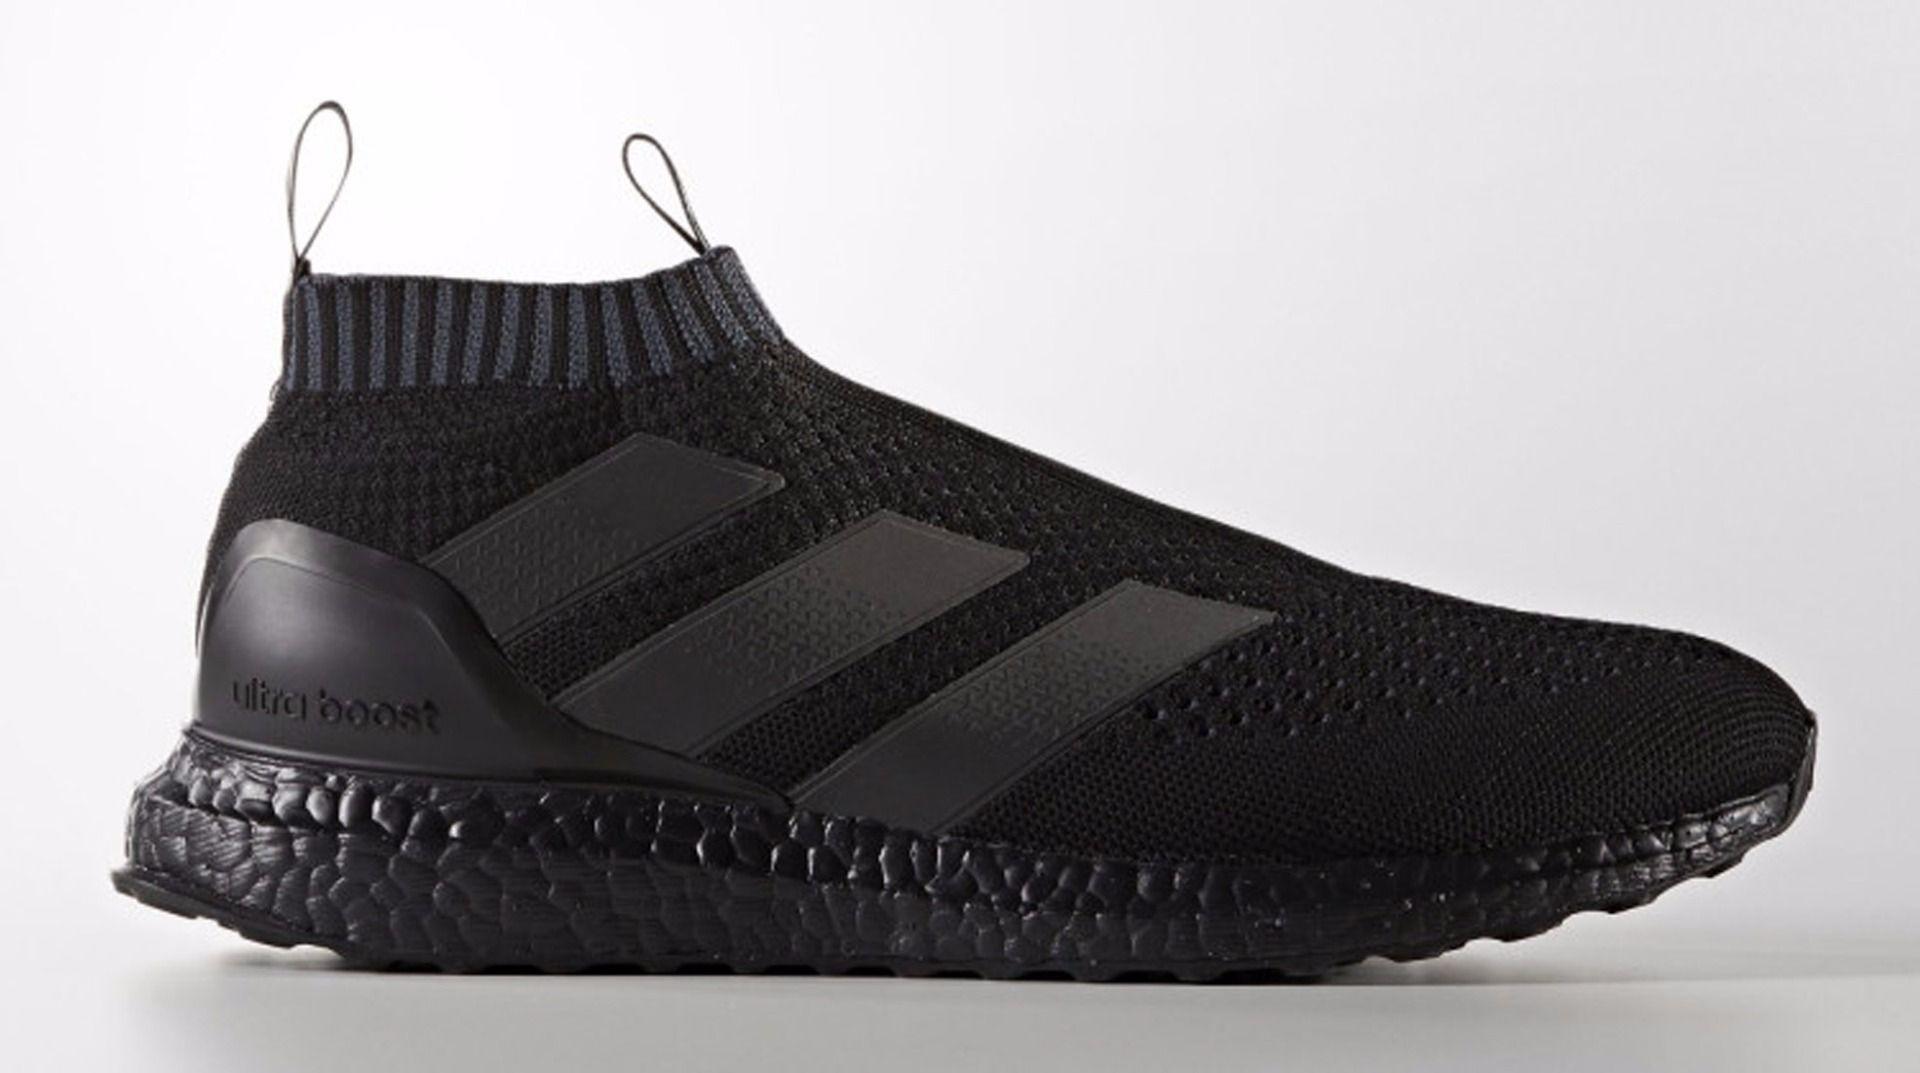 ... adidas ace 16+ purecontrol ultra boost triple black